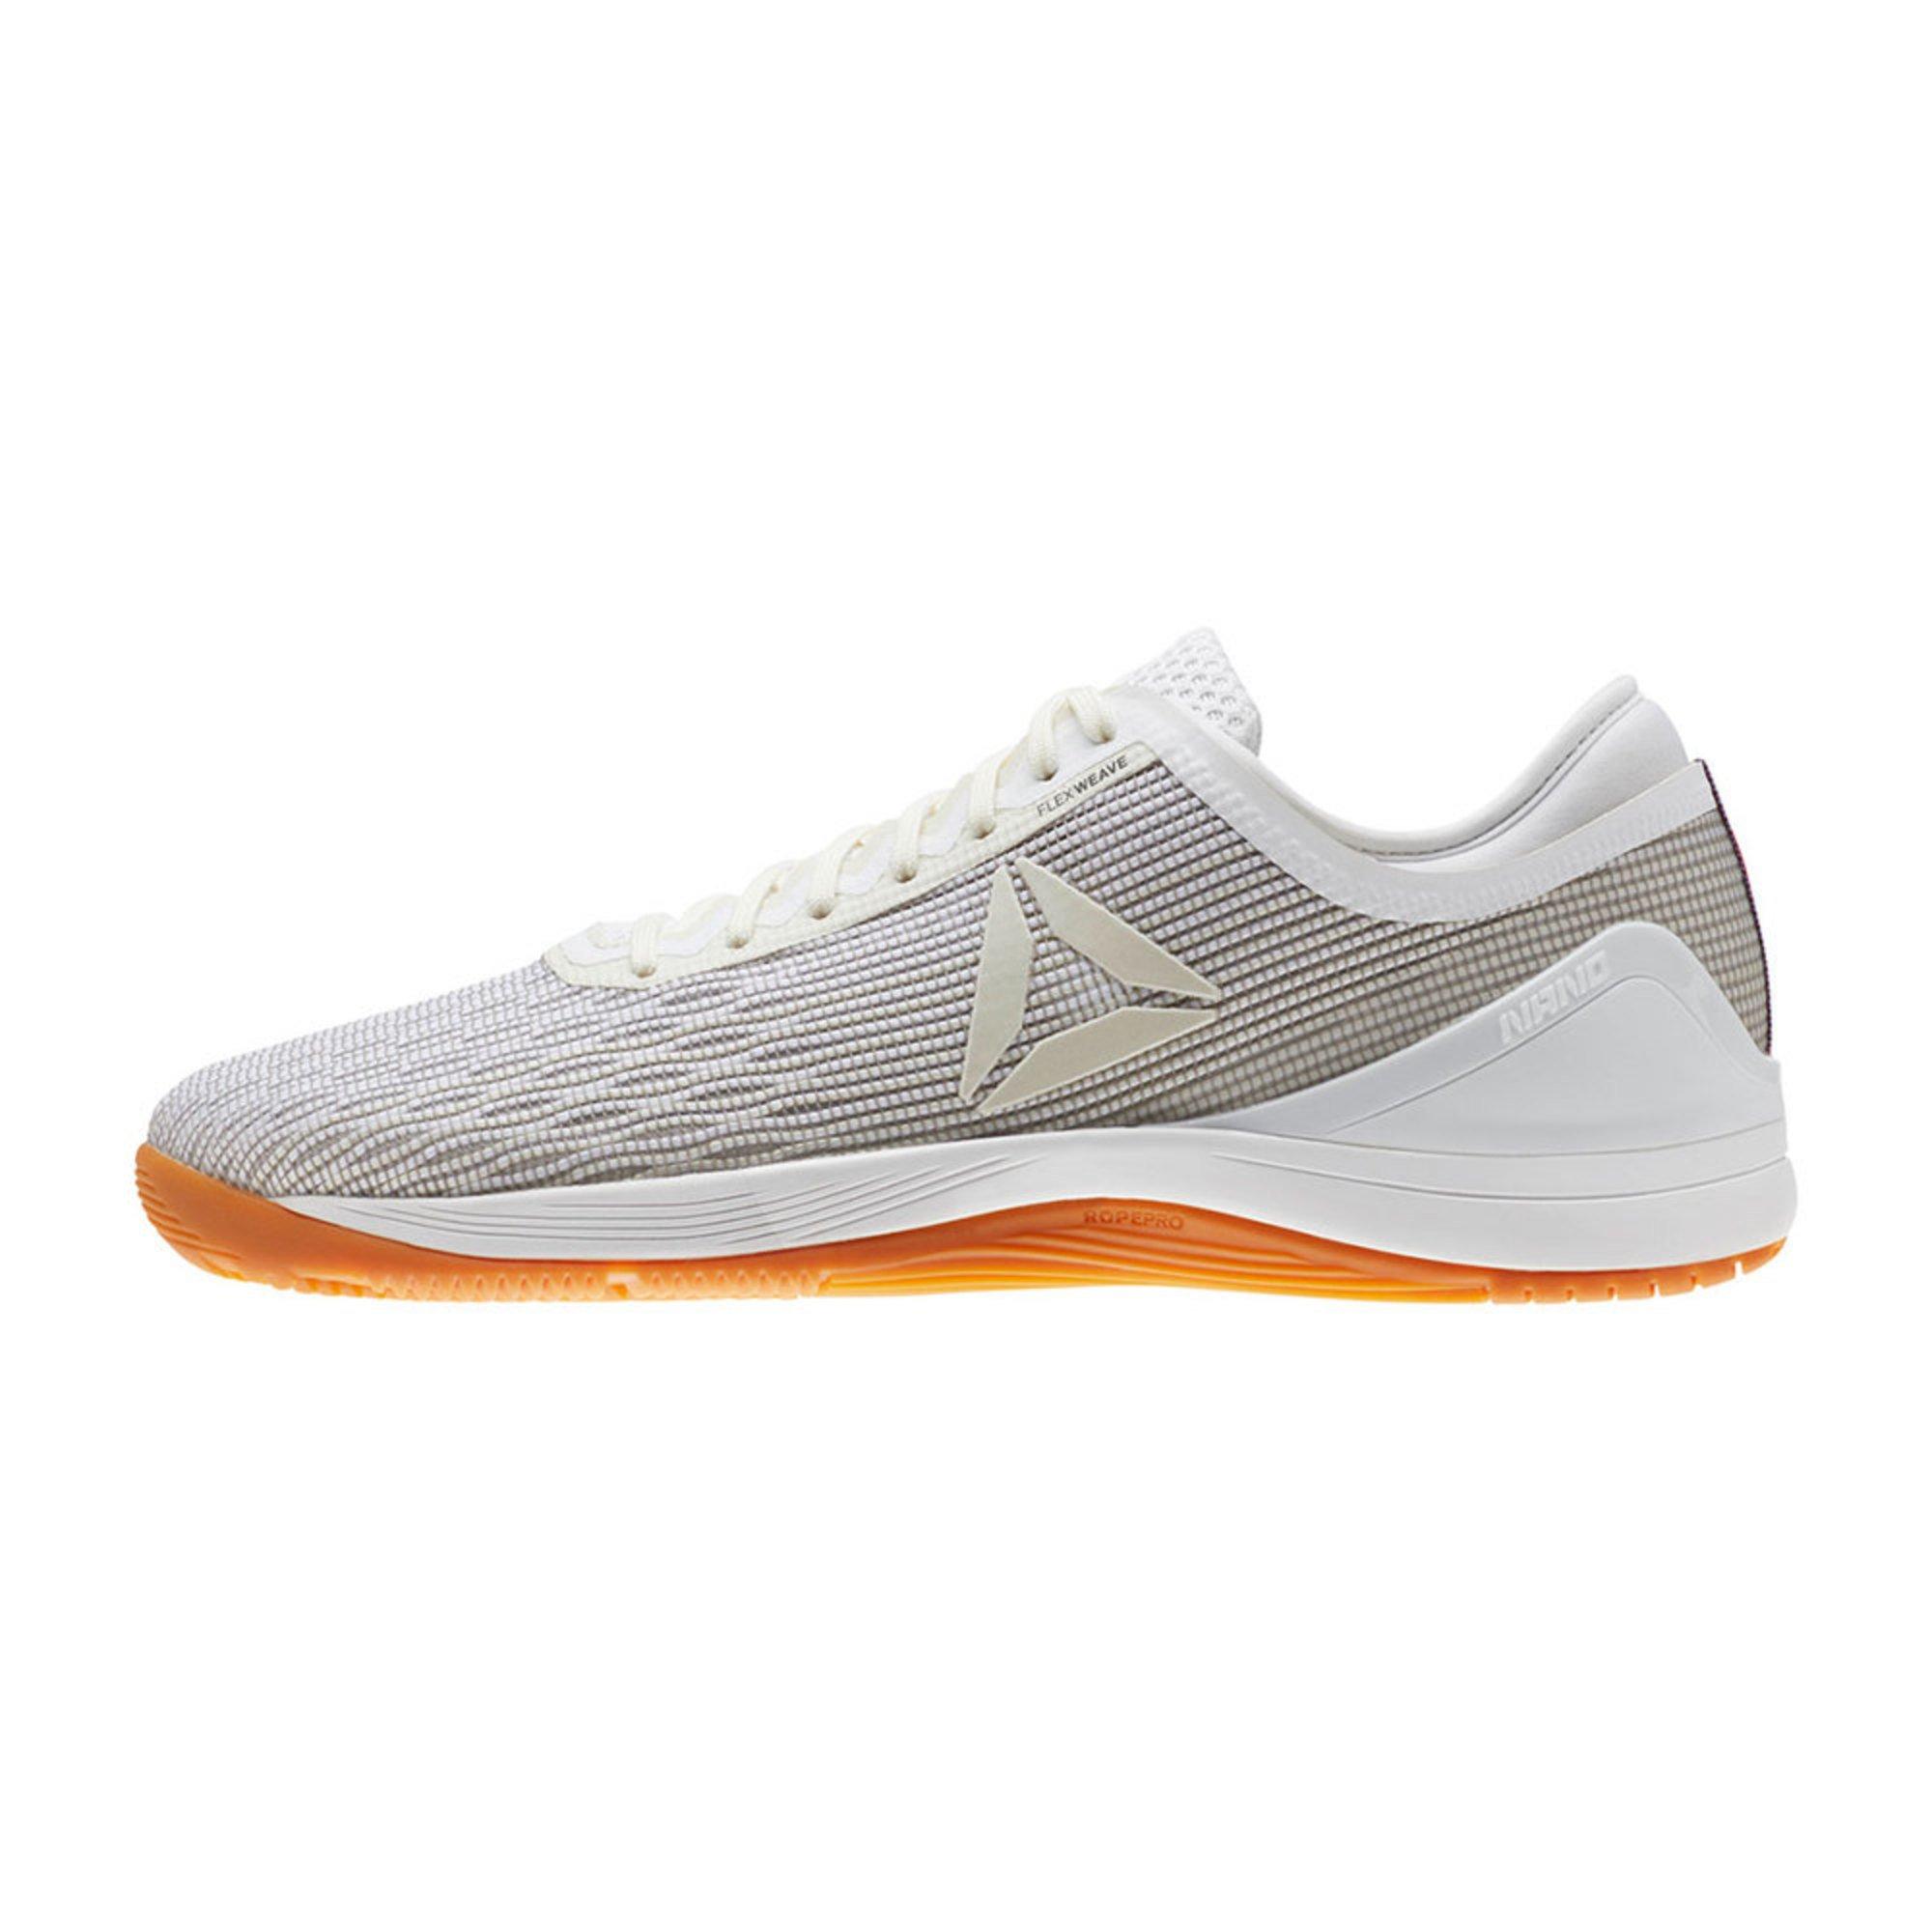 57f73eccbd5 Reebok. Reebok Men s Crossfit Nano 8.0 Crossfit Training Shoe